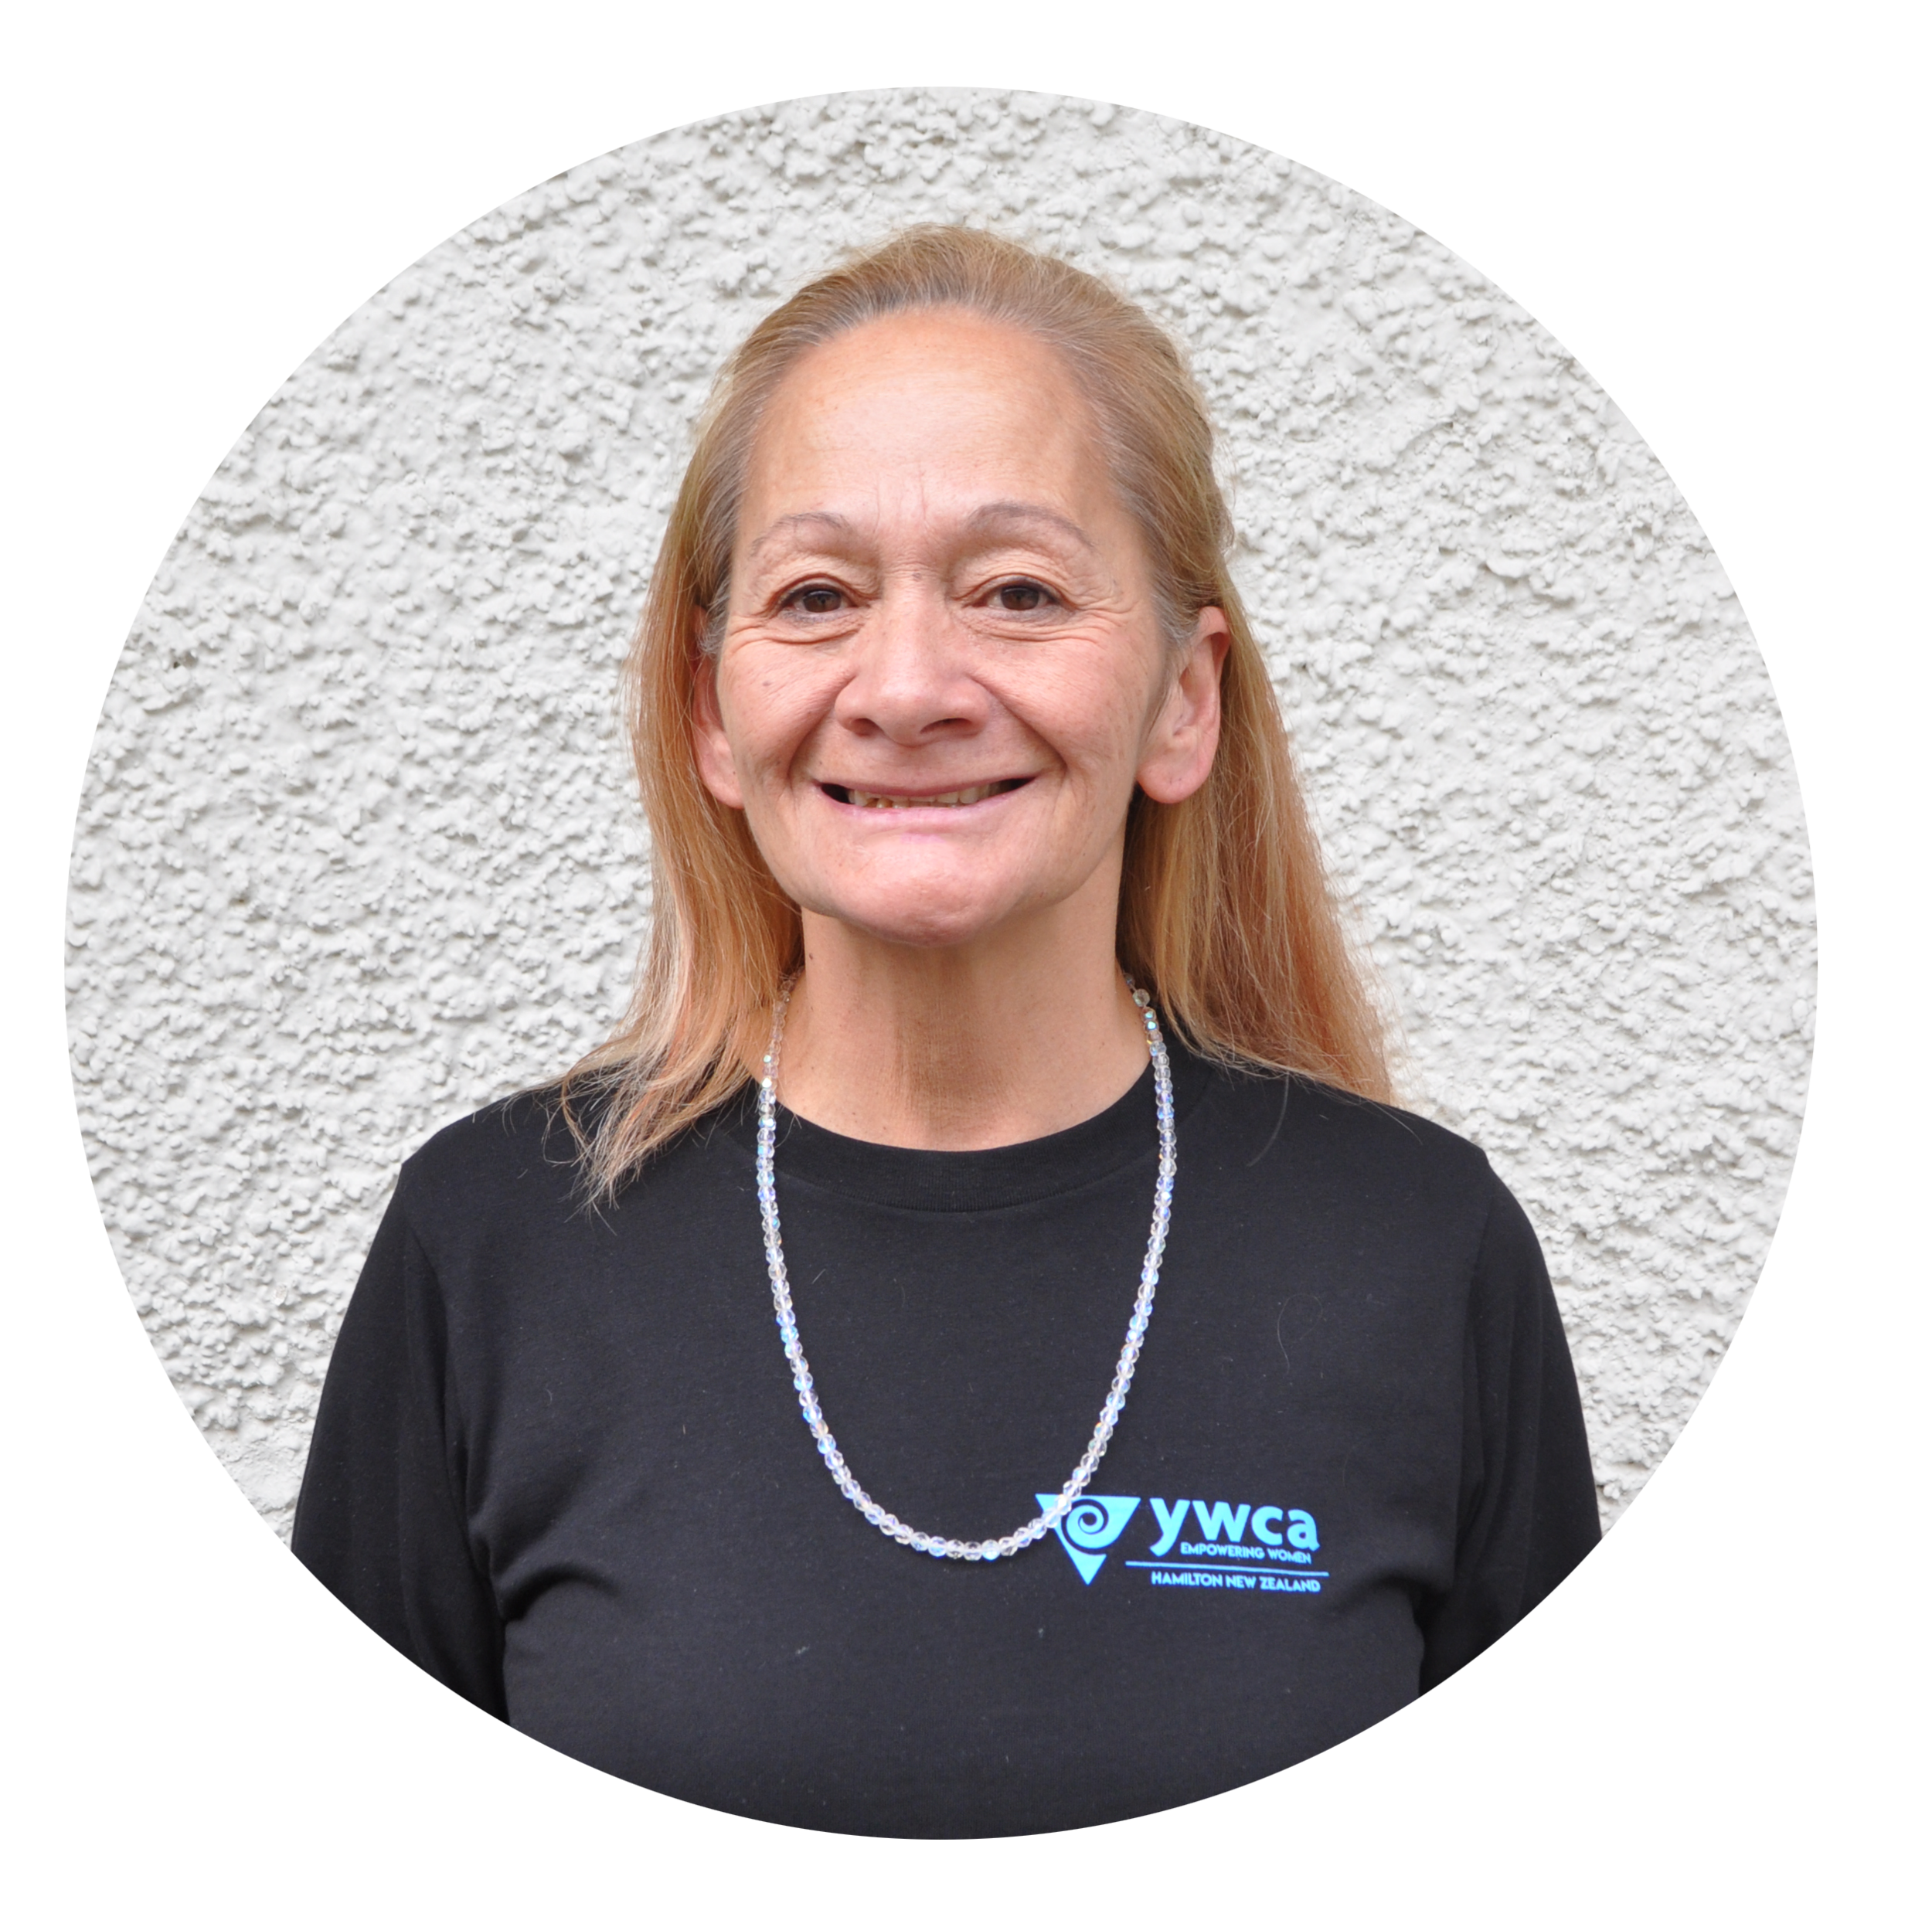 Sarah Phillips - Hostel Duty Managerhostel@ywcahamilton.org.nz